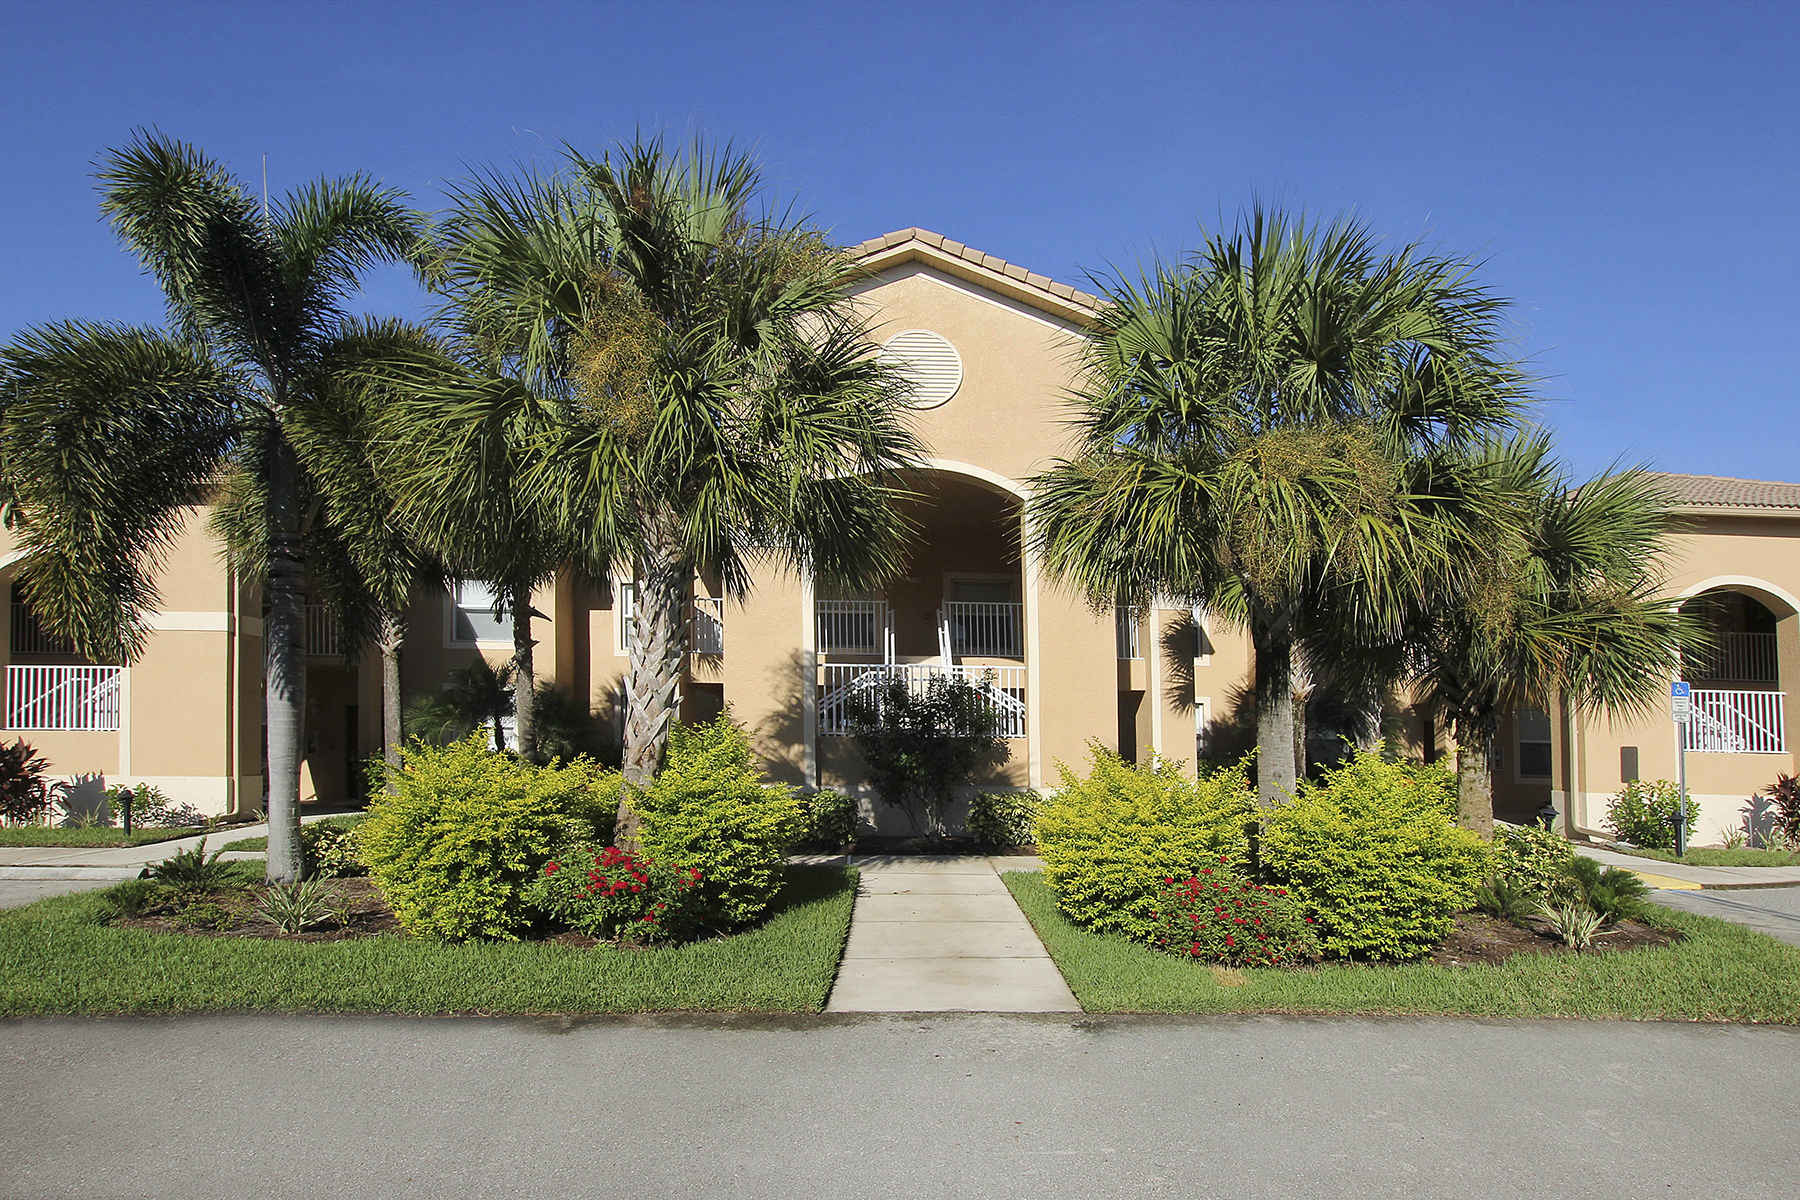 Condomínio para Venda às BELLA TERRA 20000 Barletta Ln 713 Estero, Florida, 33928 Estados Unidos